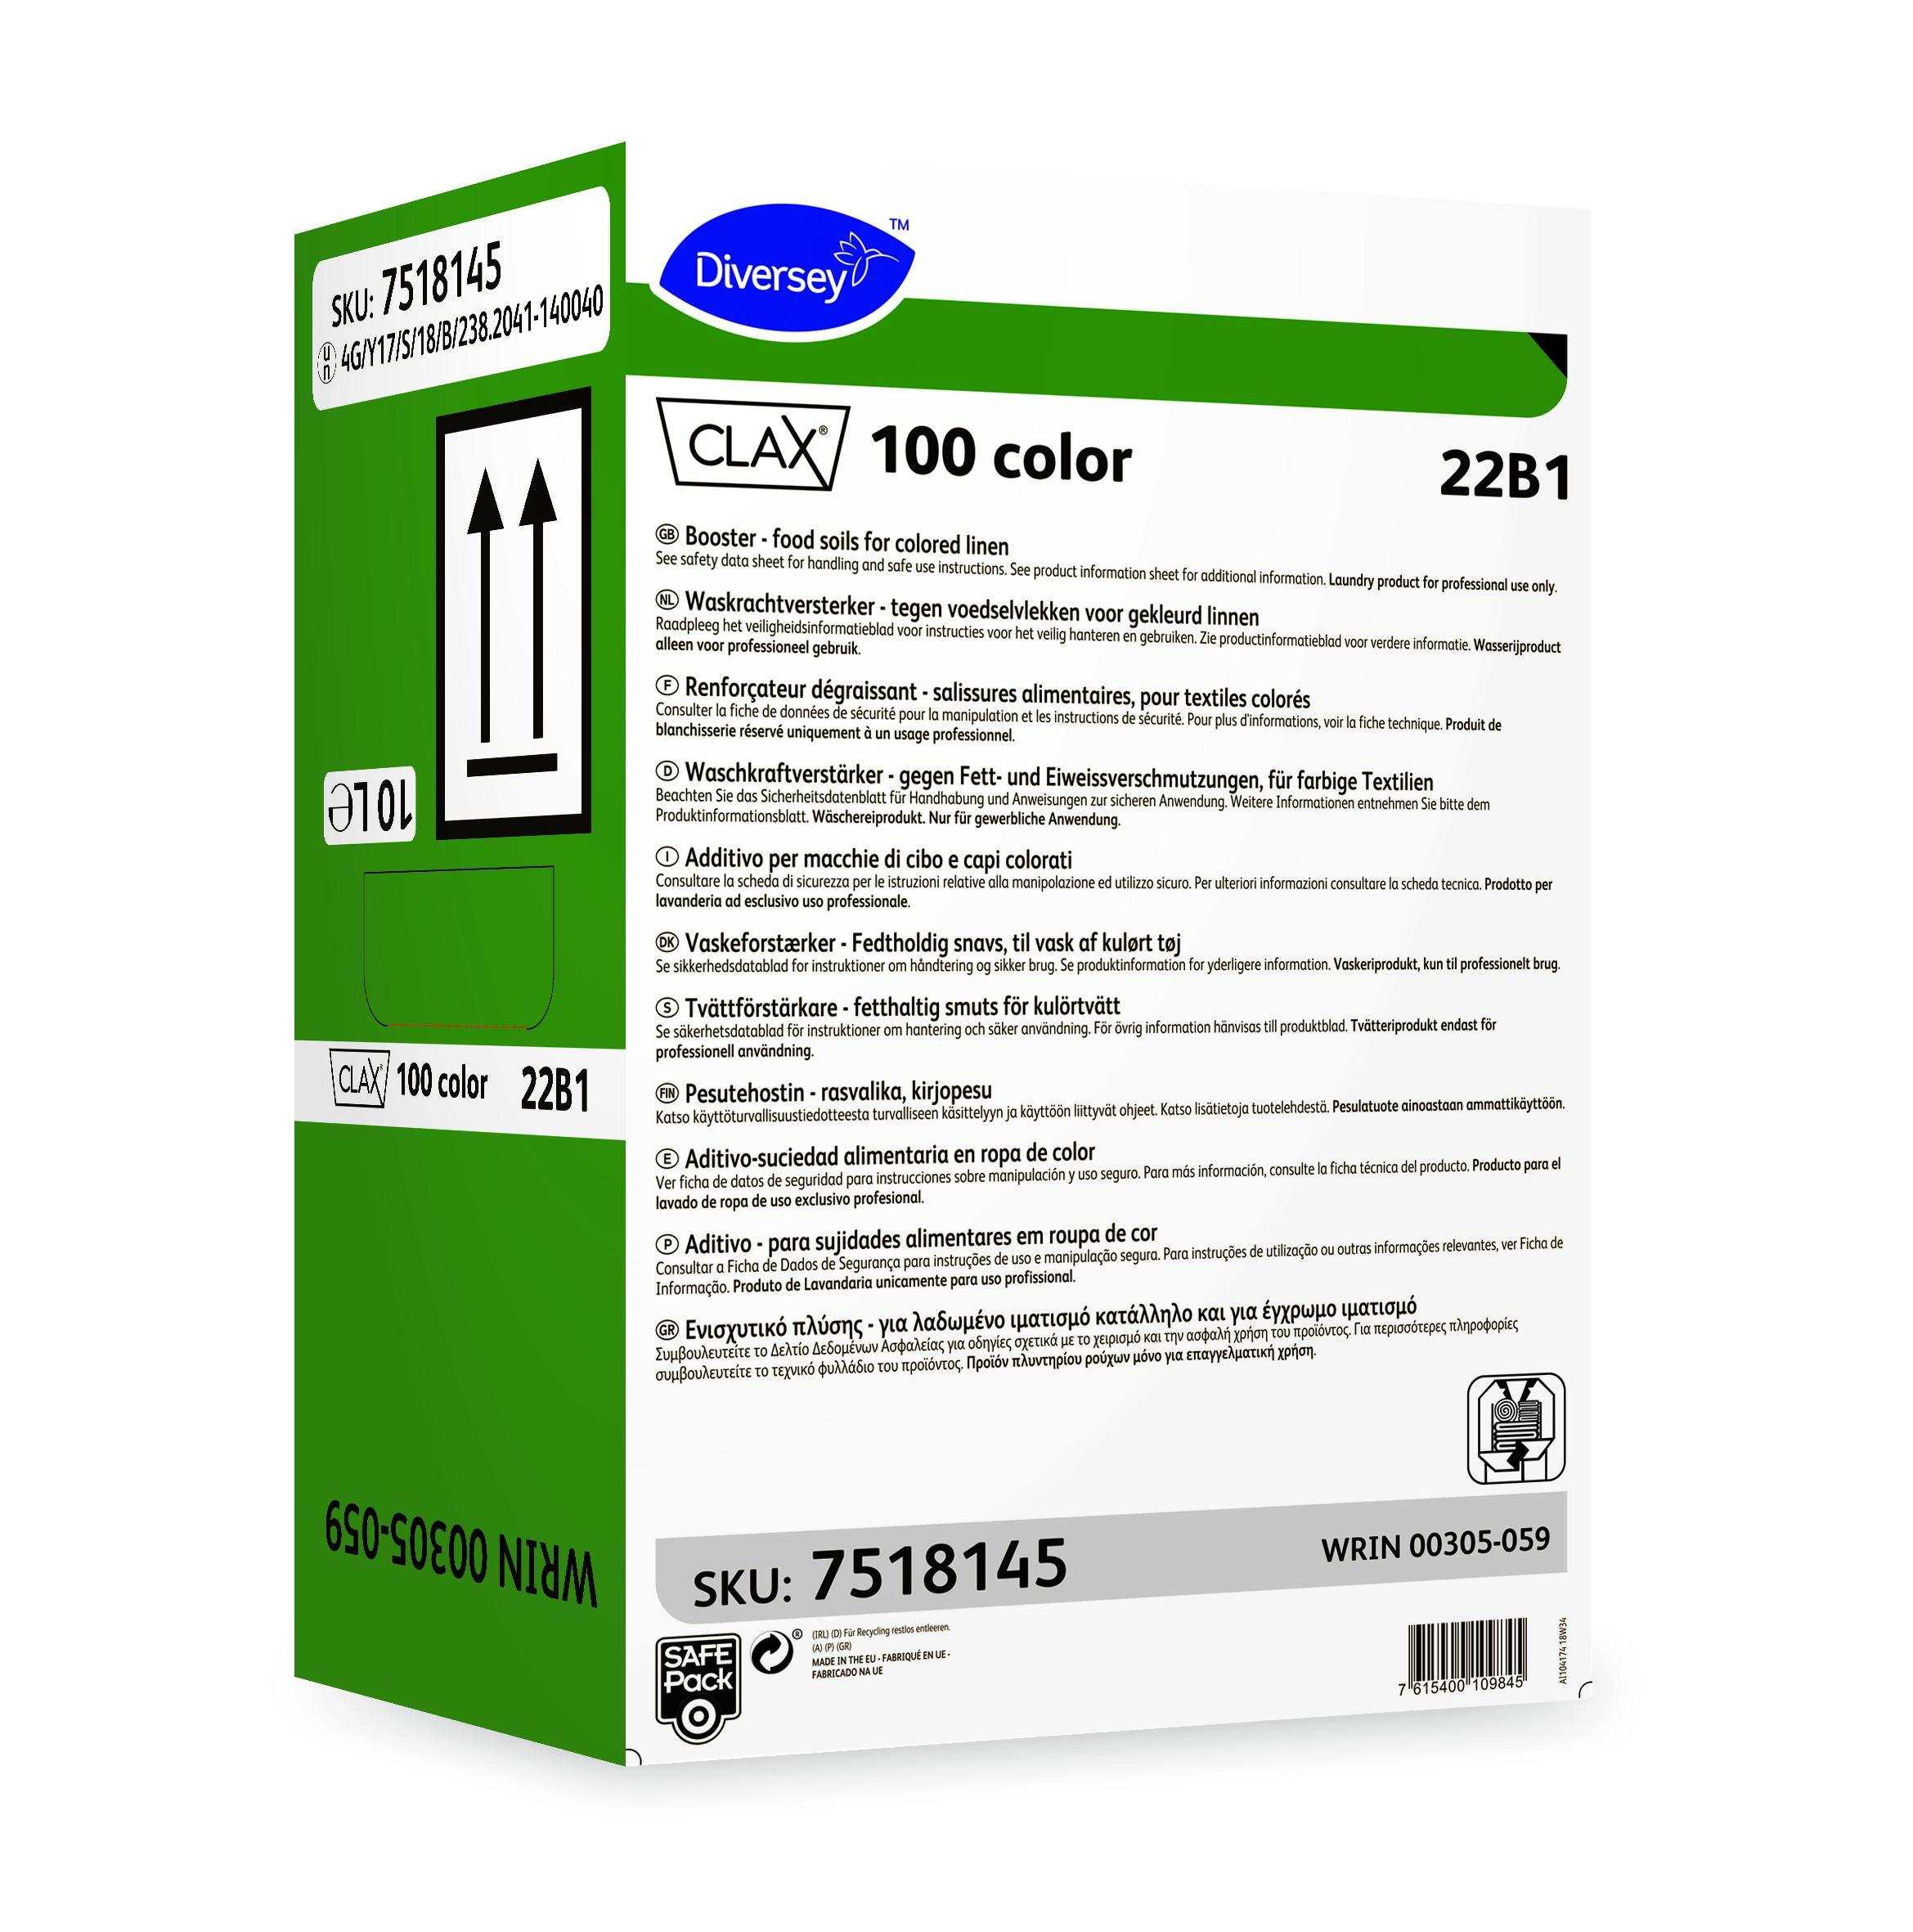 7518145-Clax-100-color-22B1-10L-CMYK-20x20cm.jpg